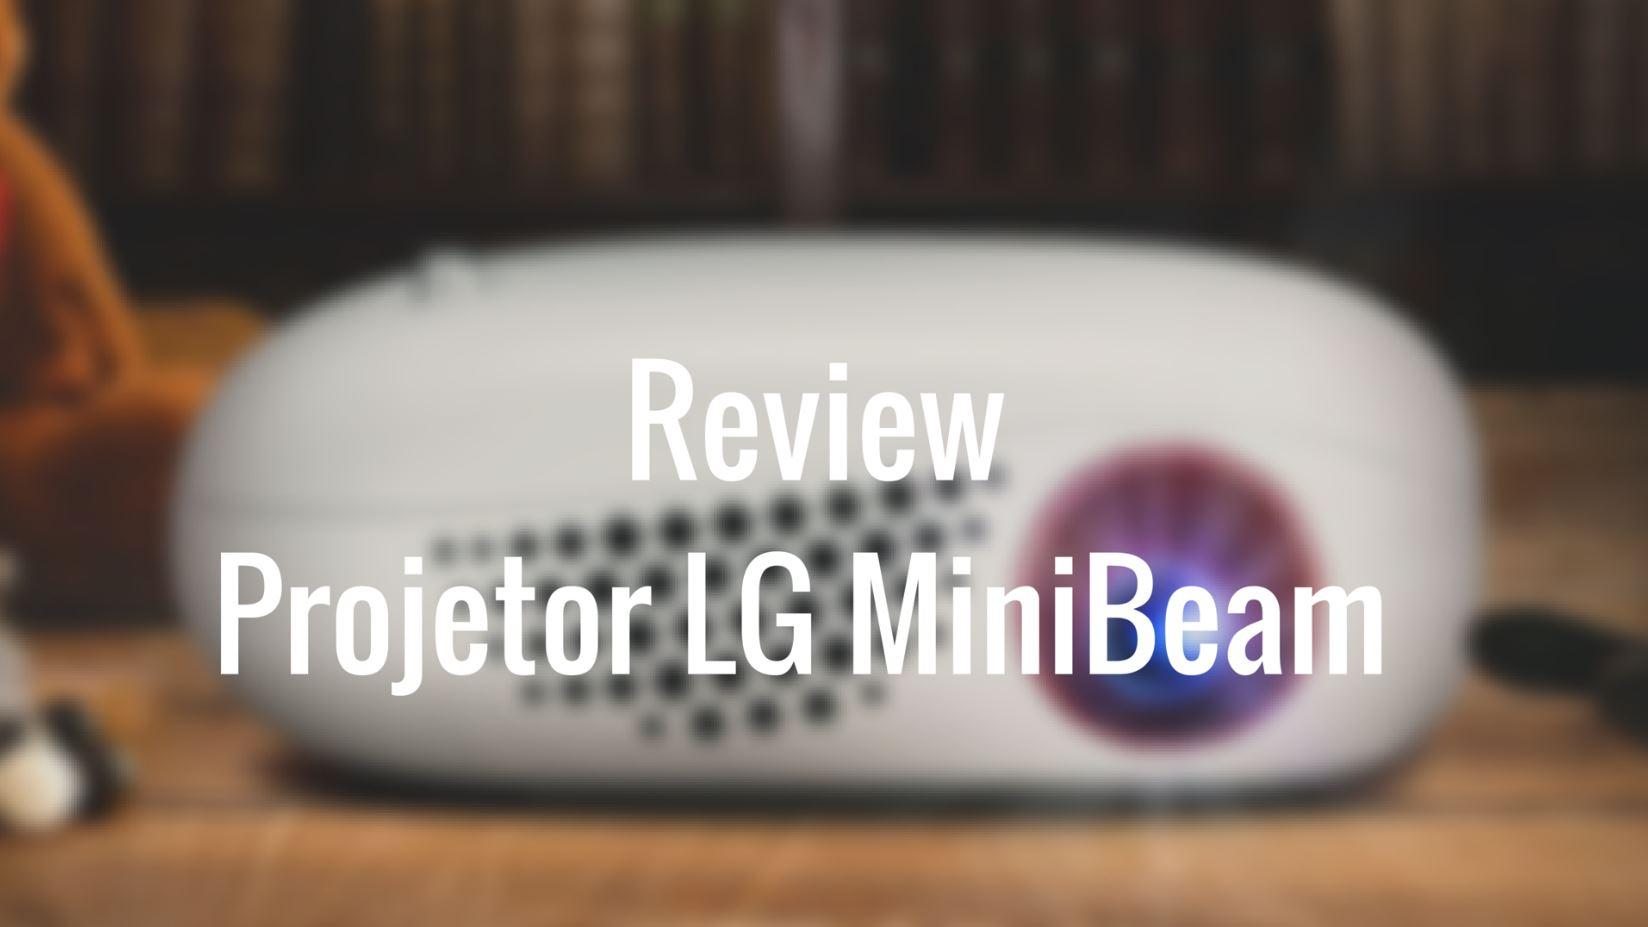 Review projetor LG Minibeam